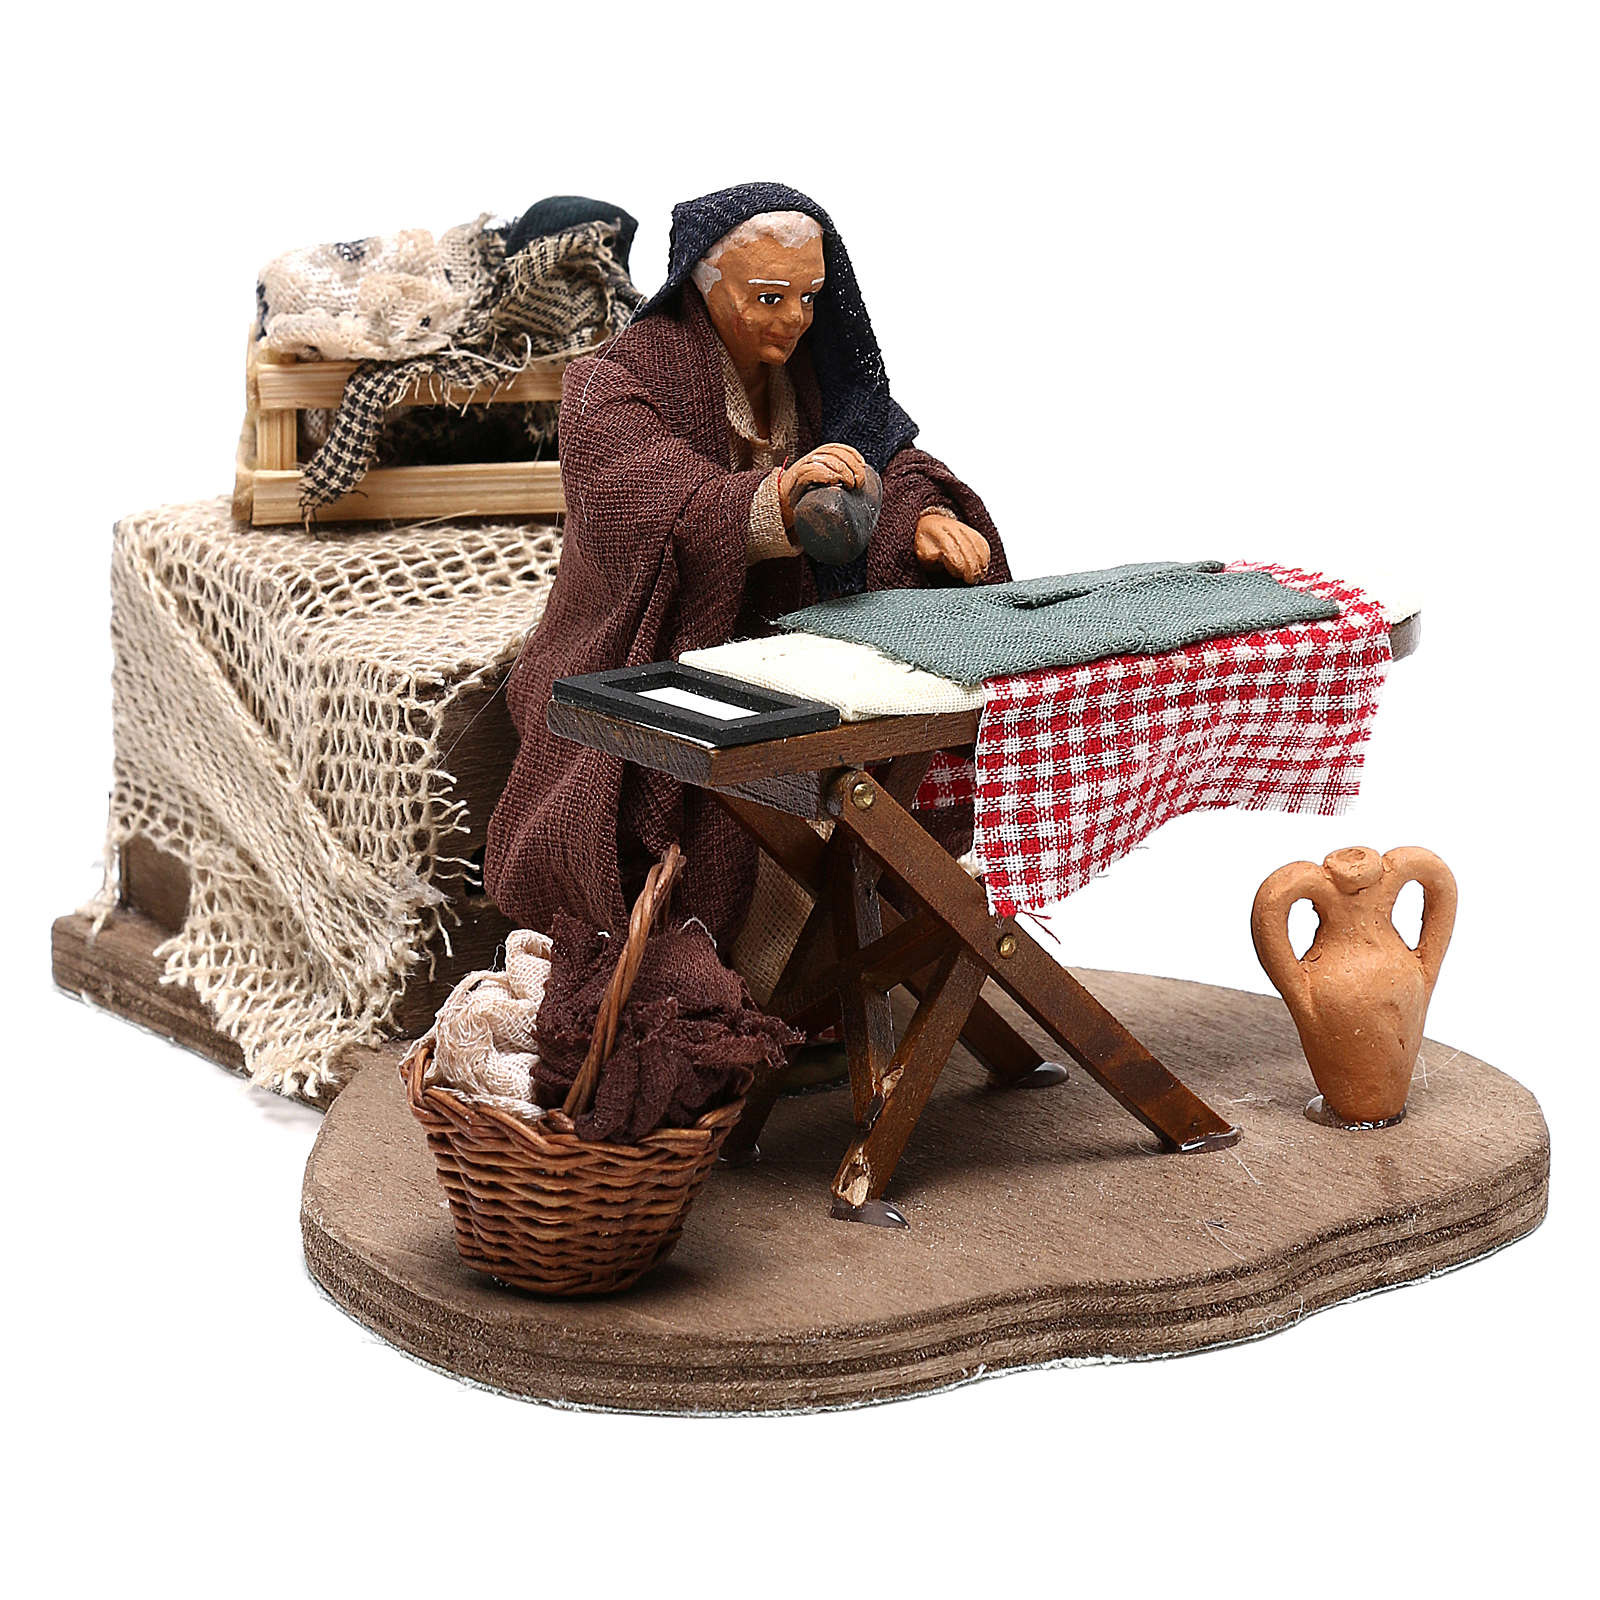 Woman ironing 10 cm  for Neapolitan nativity scene 4